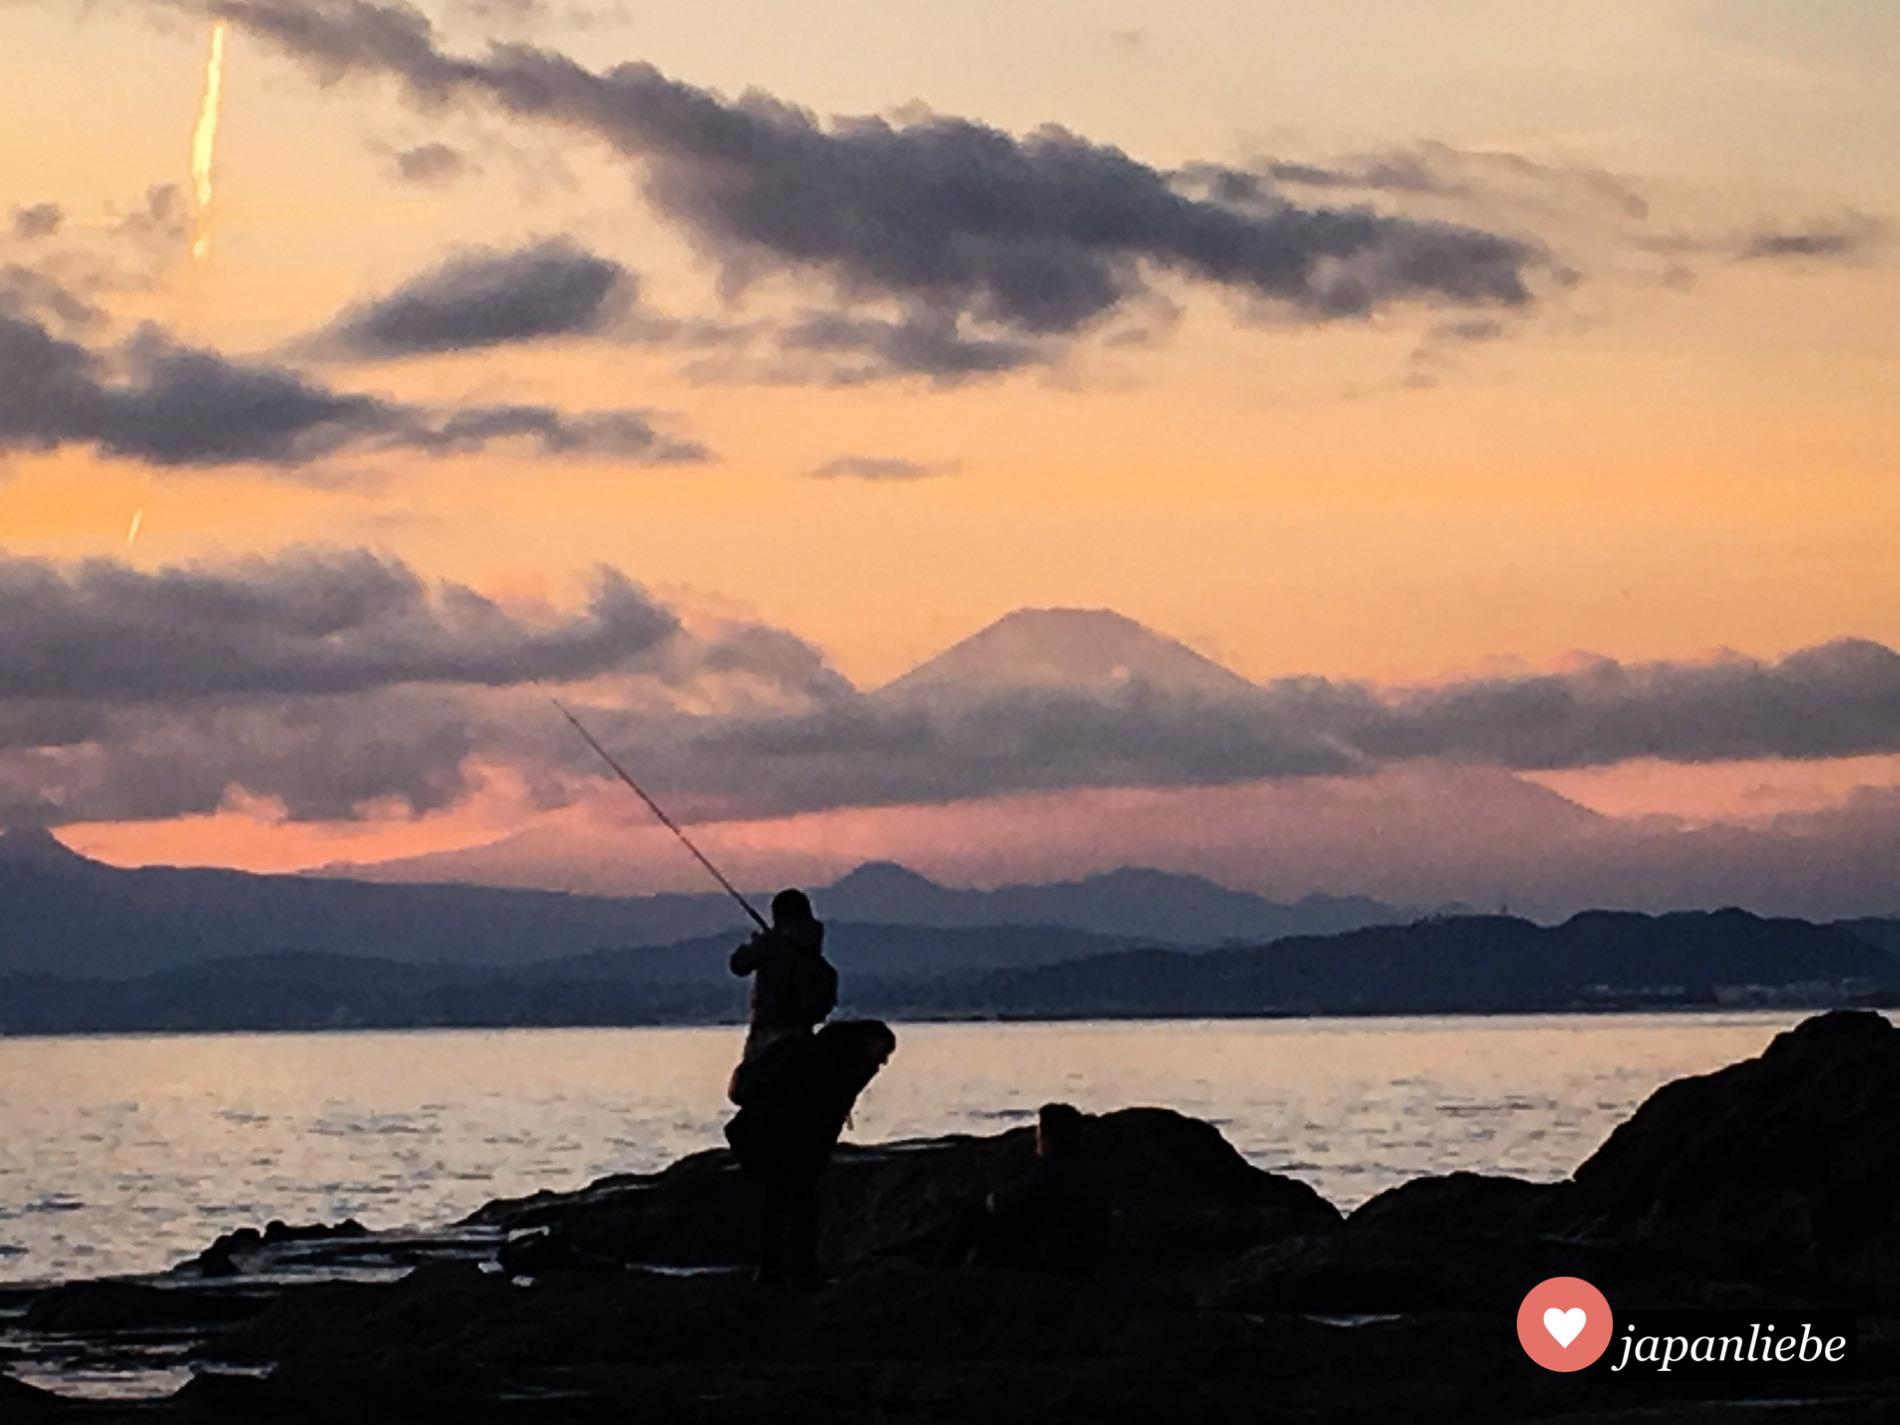 Der Fuji bei Abendrot von Enoshima aus.